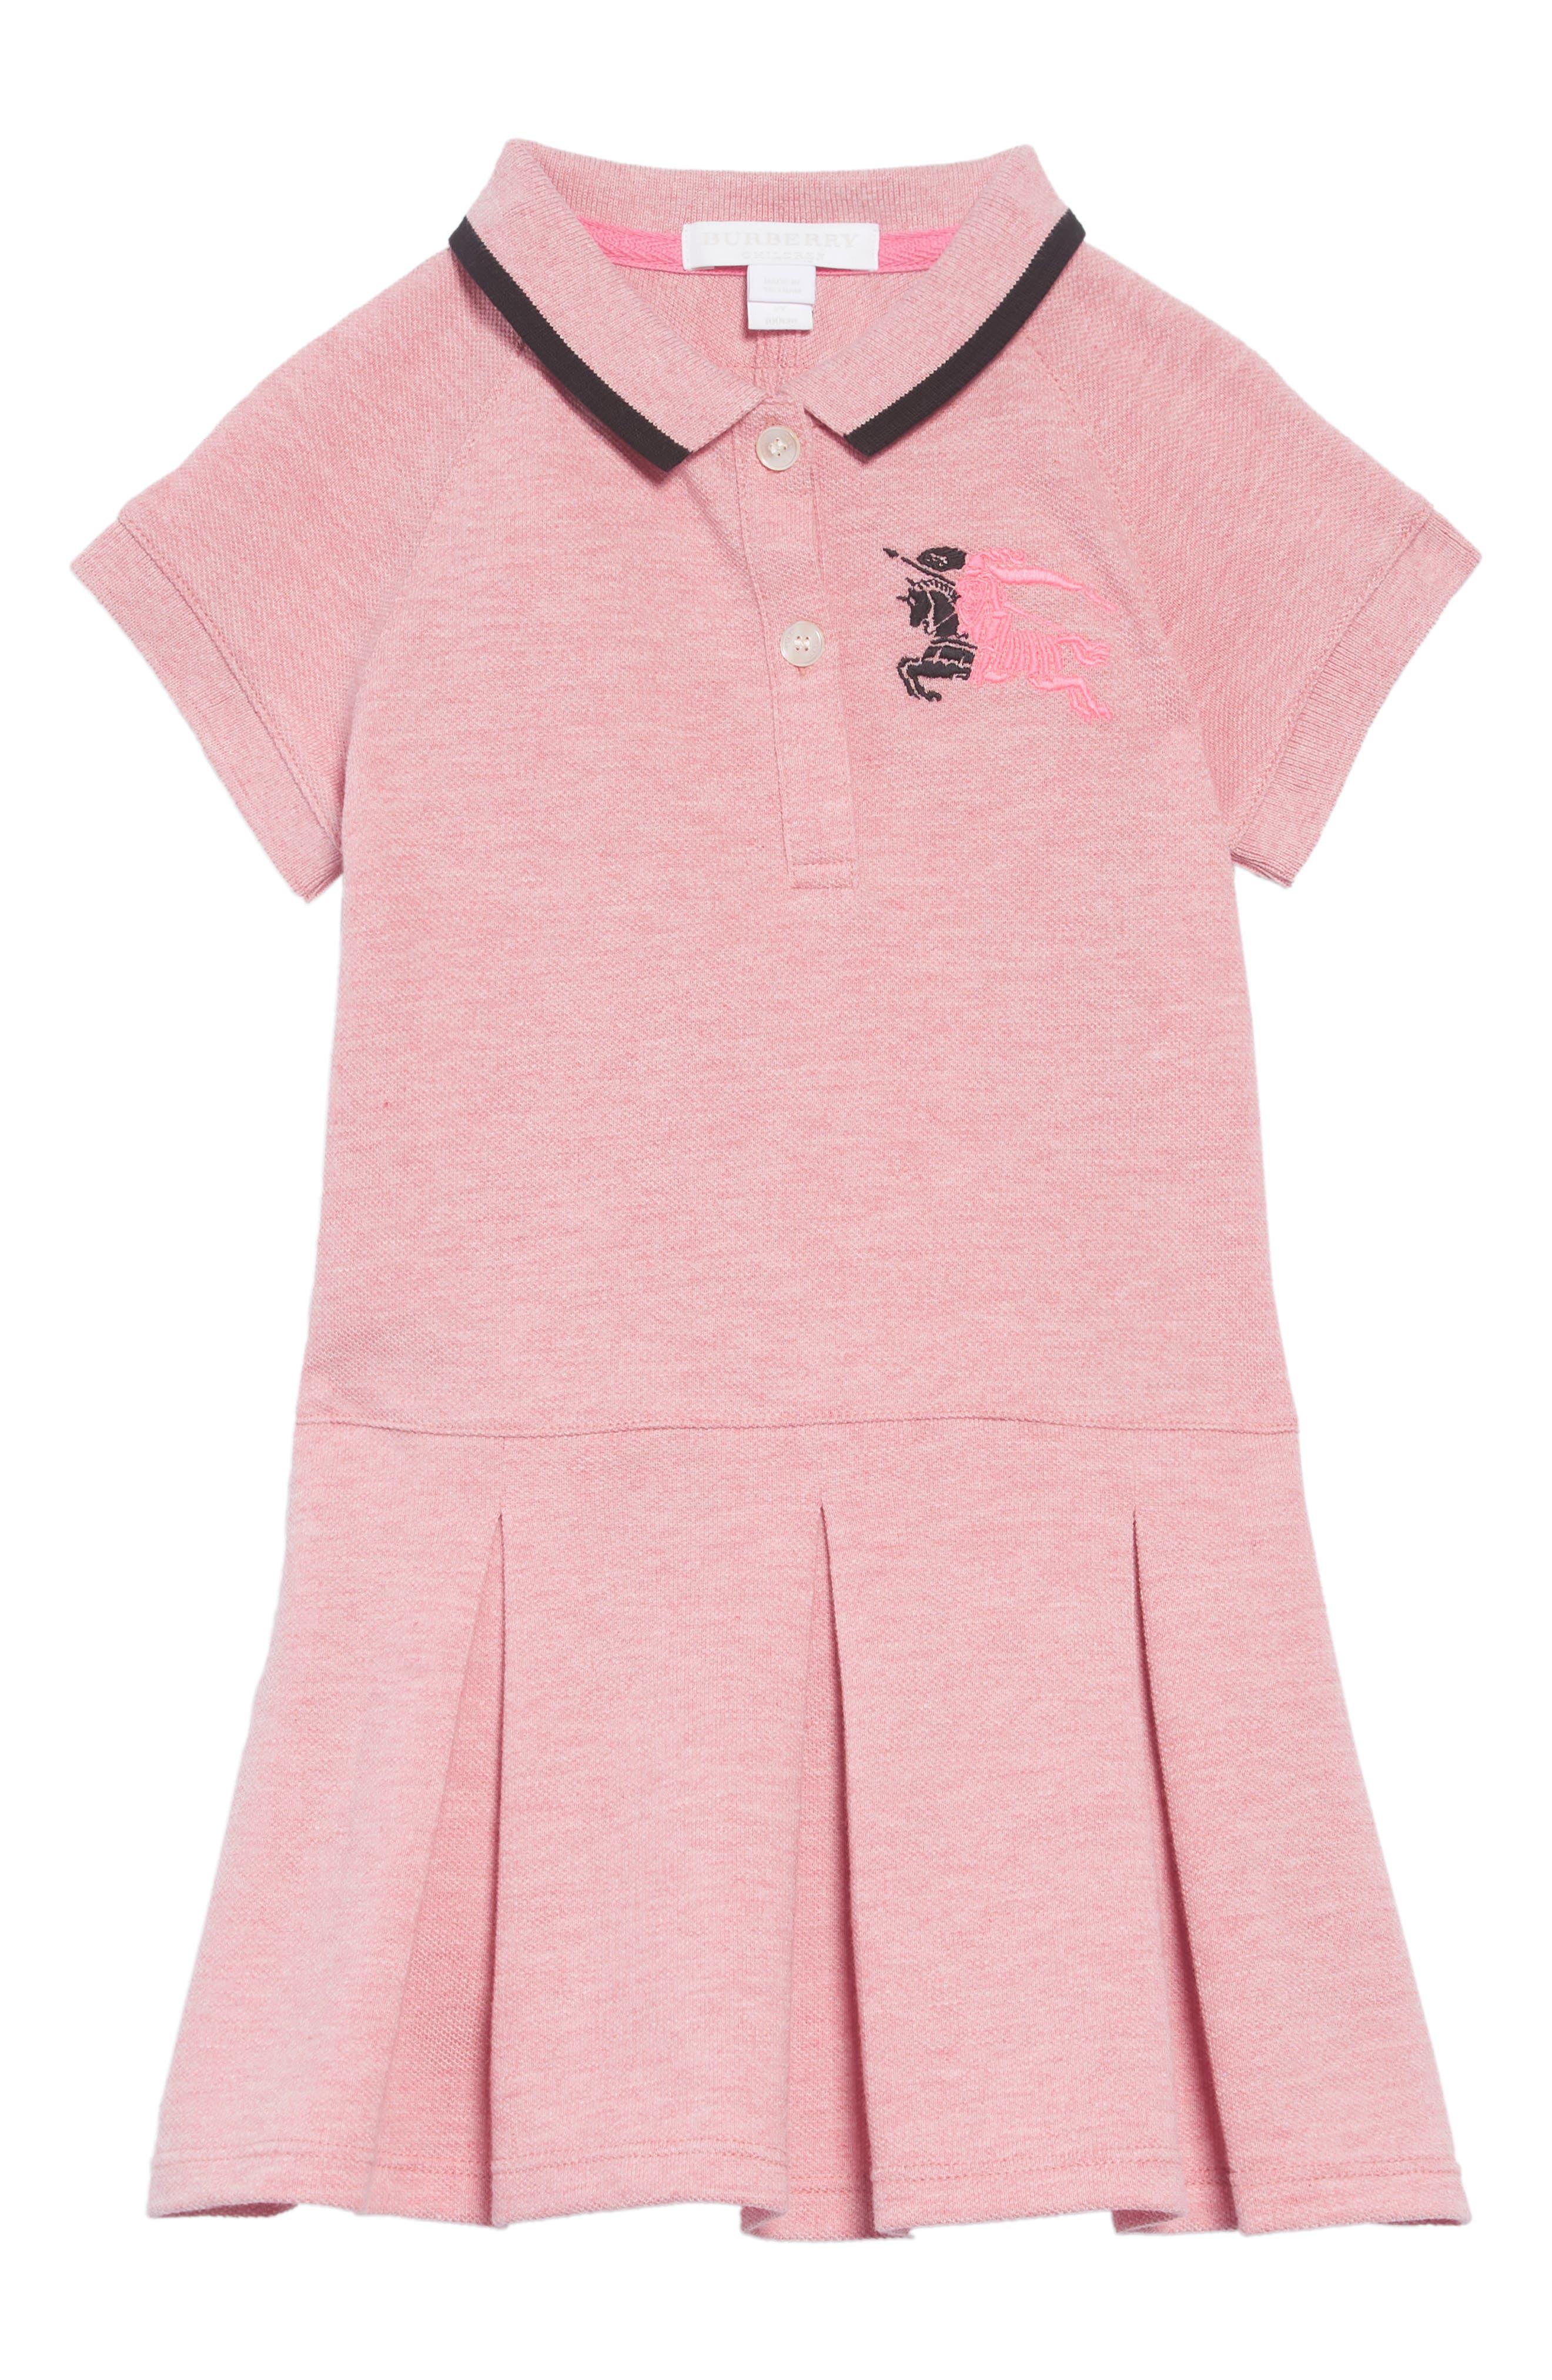 Mollyanna Polo Dress,                         Main,                         color, PALE PINK MELANGE